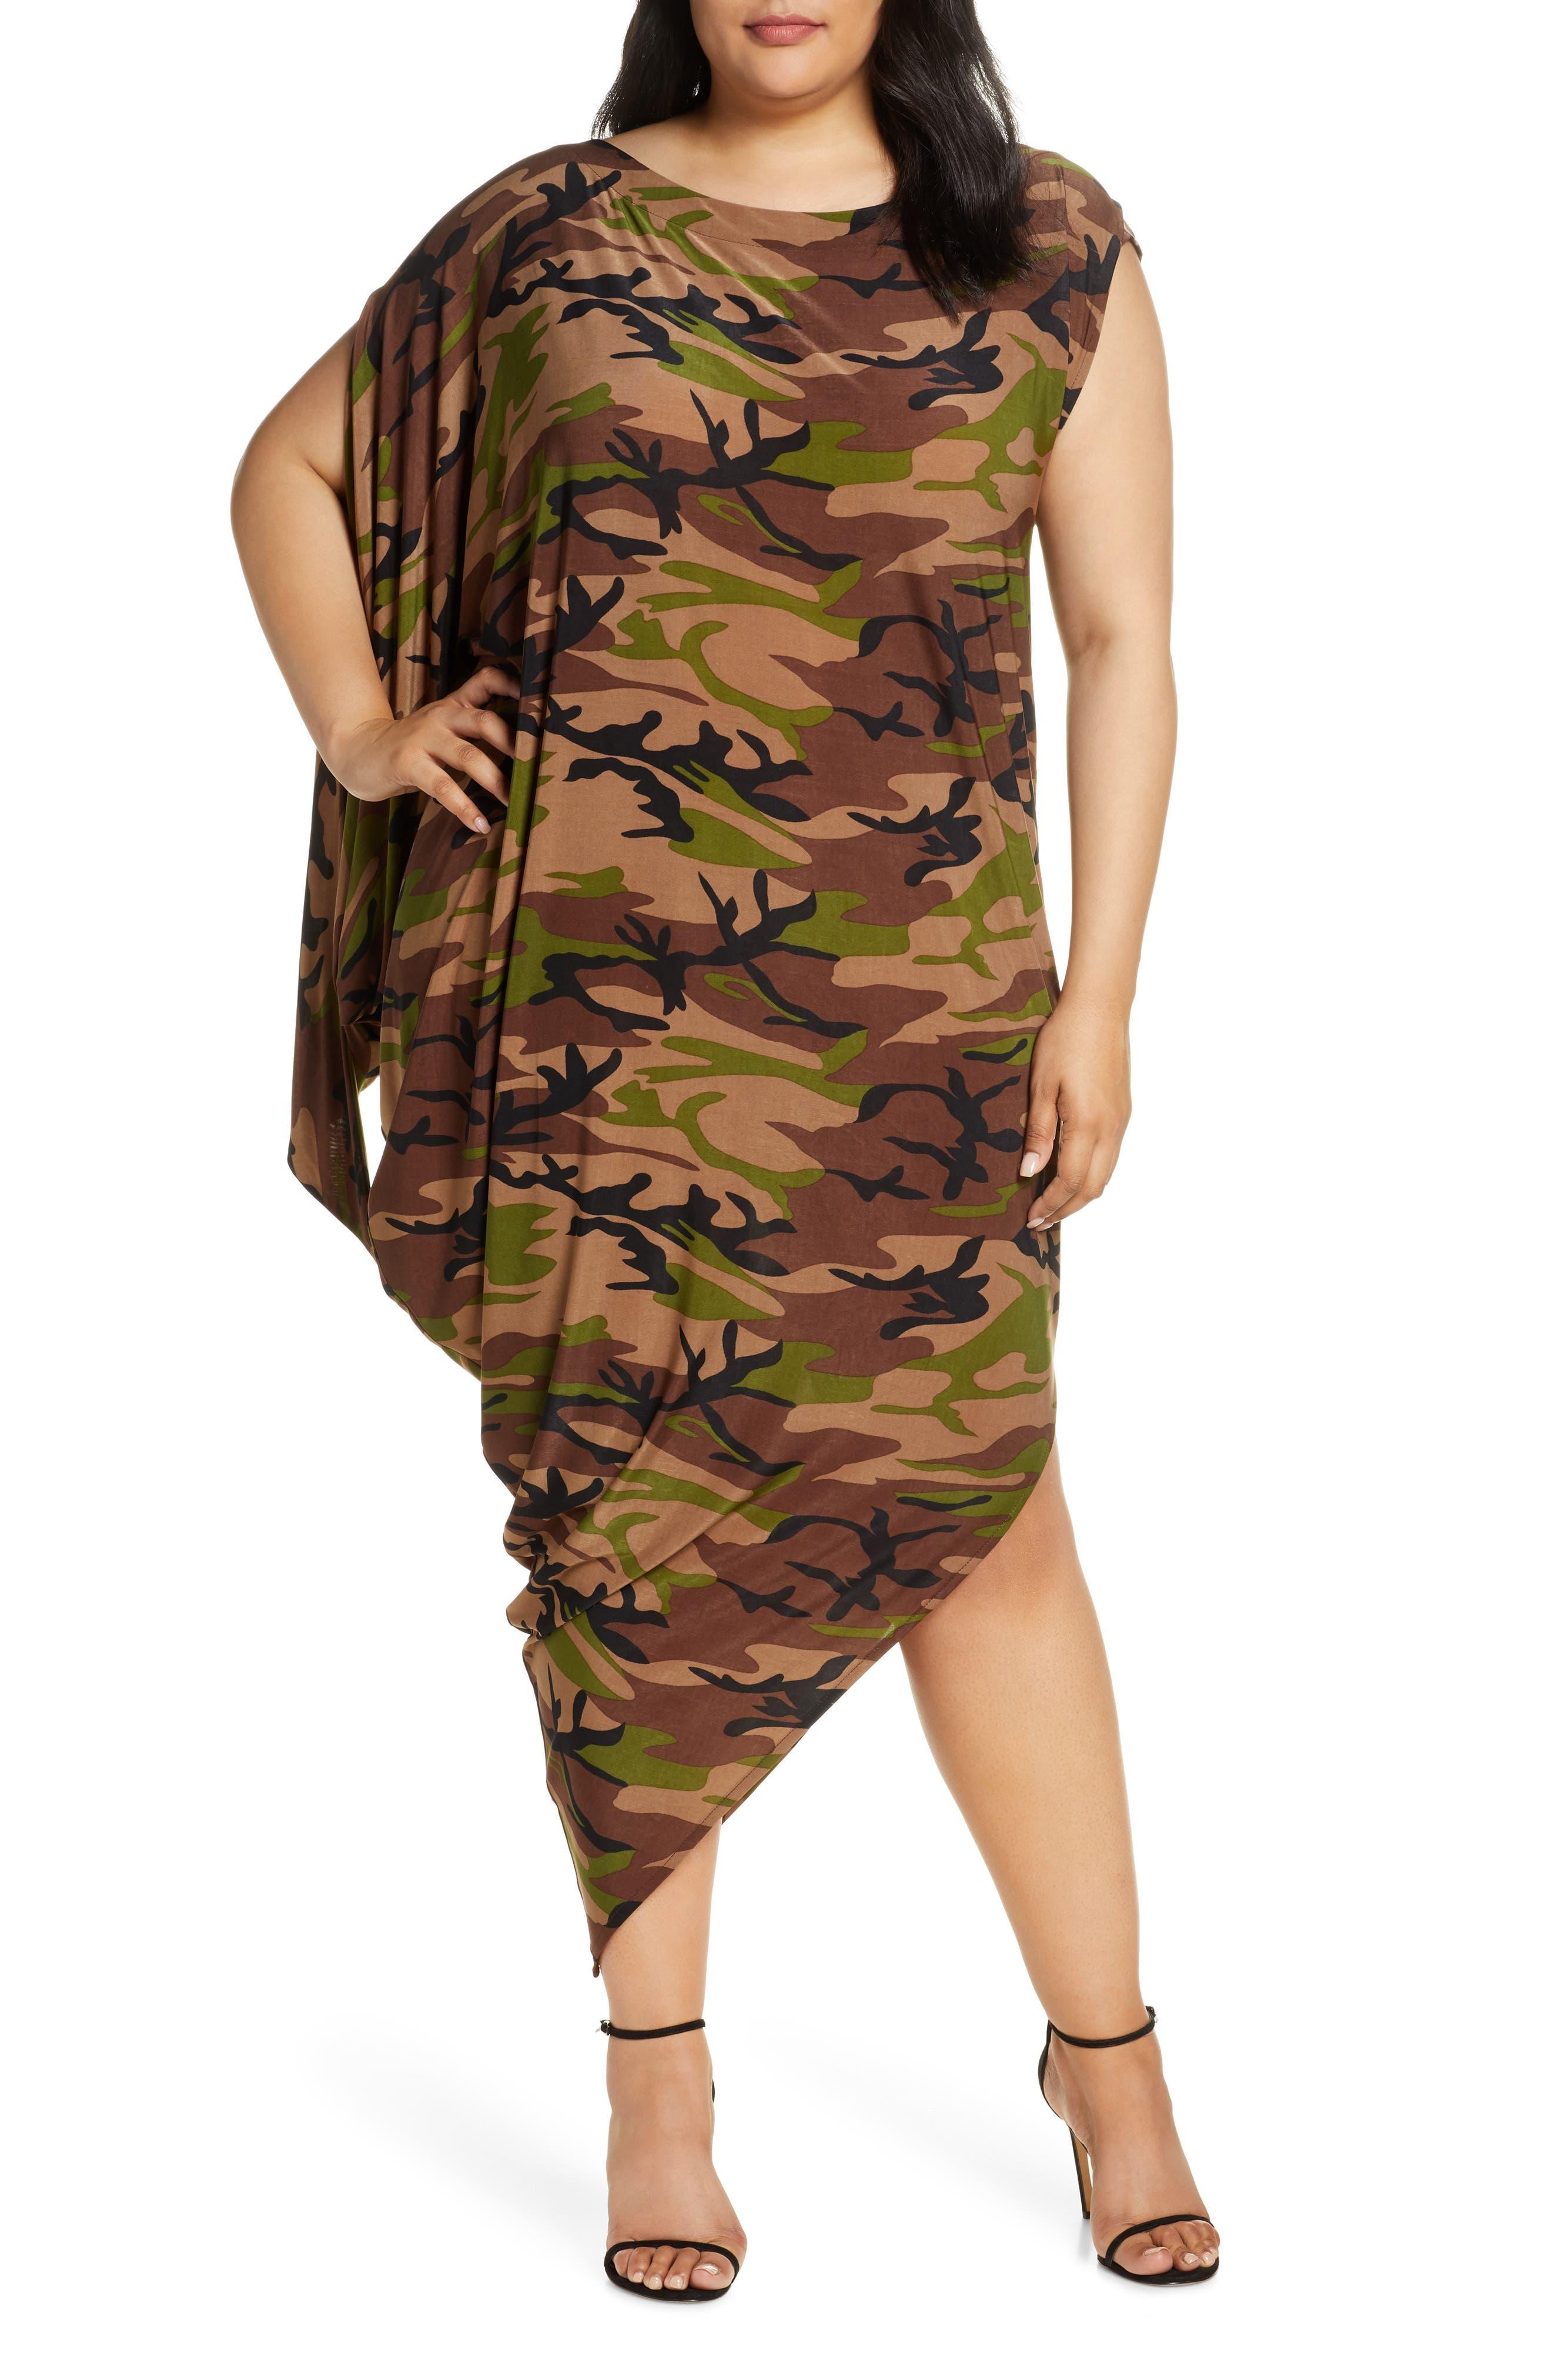 Jenny Convertible Dress